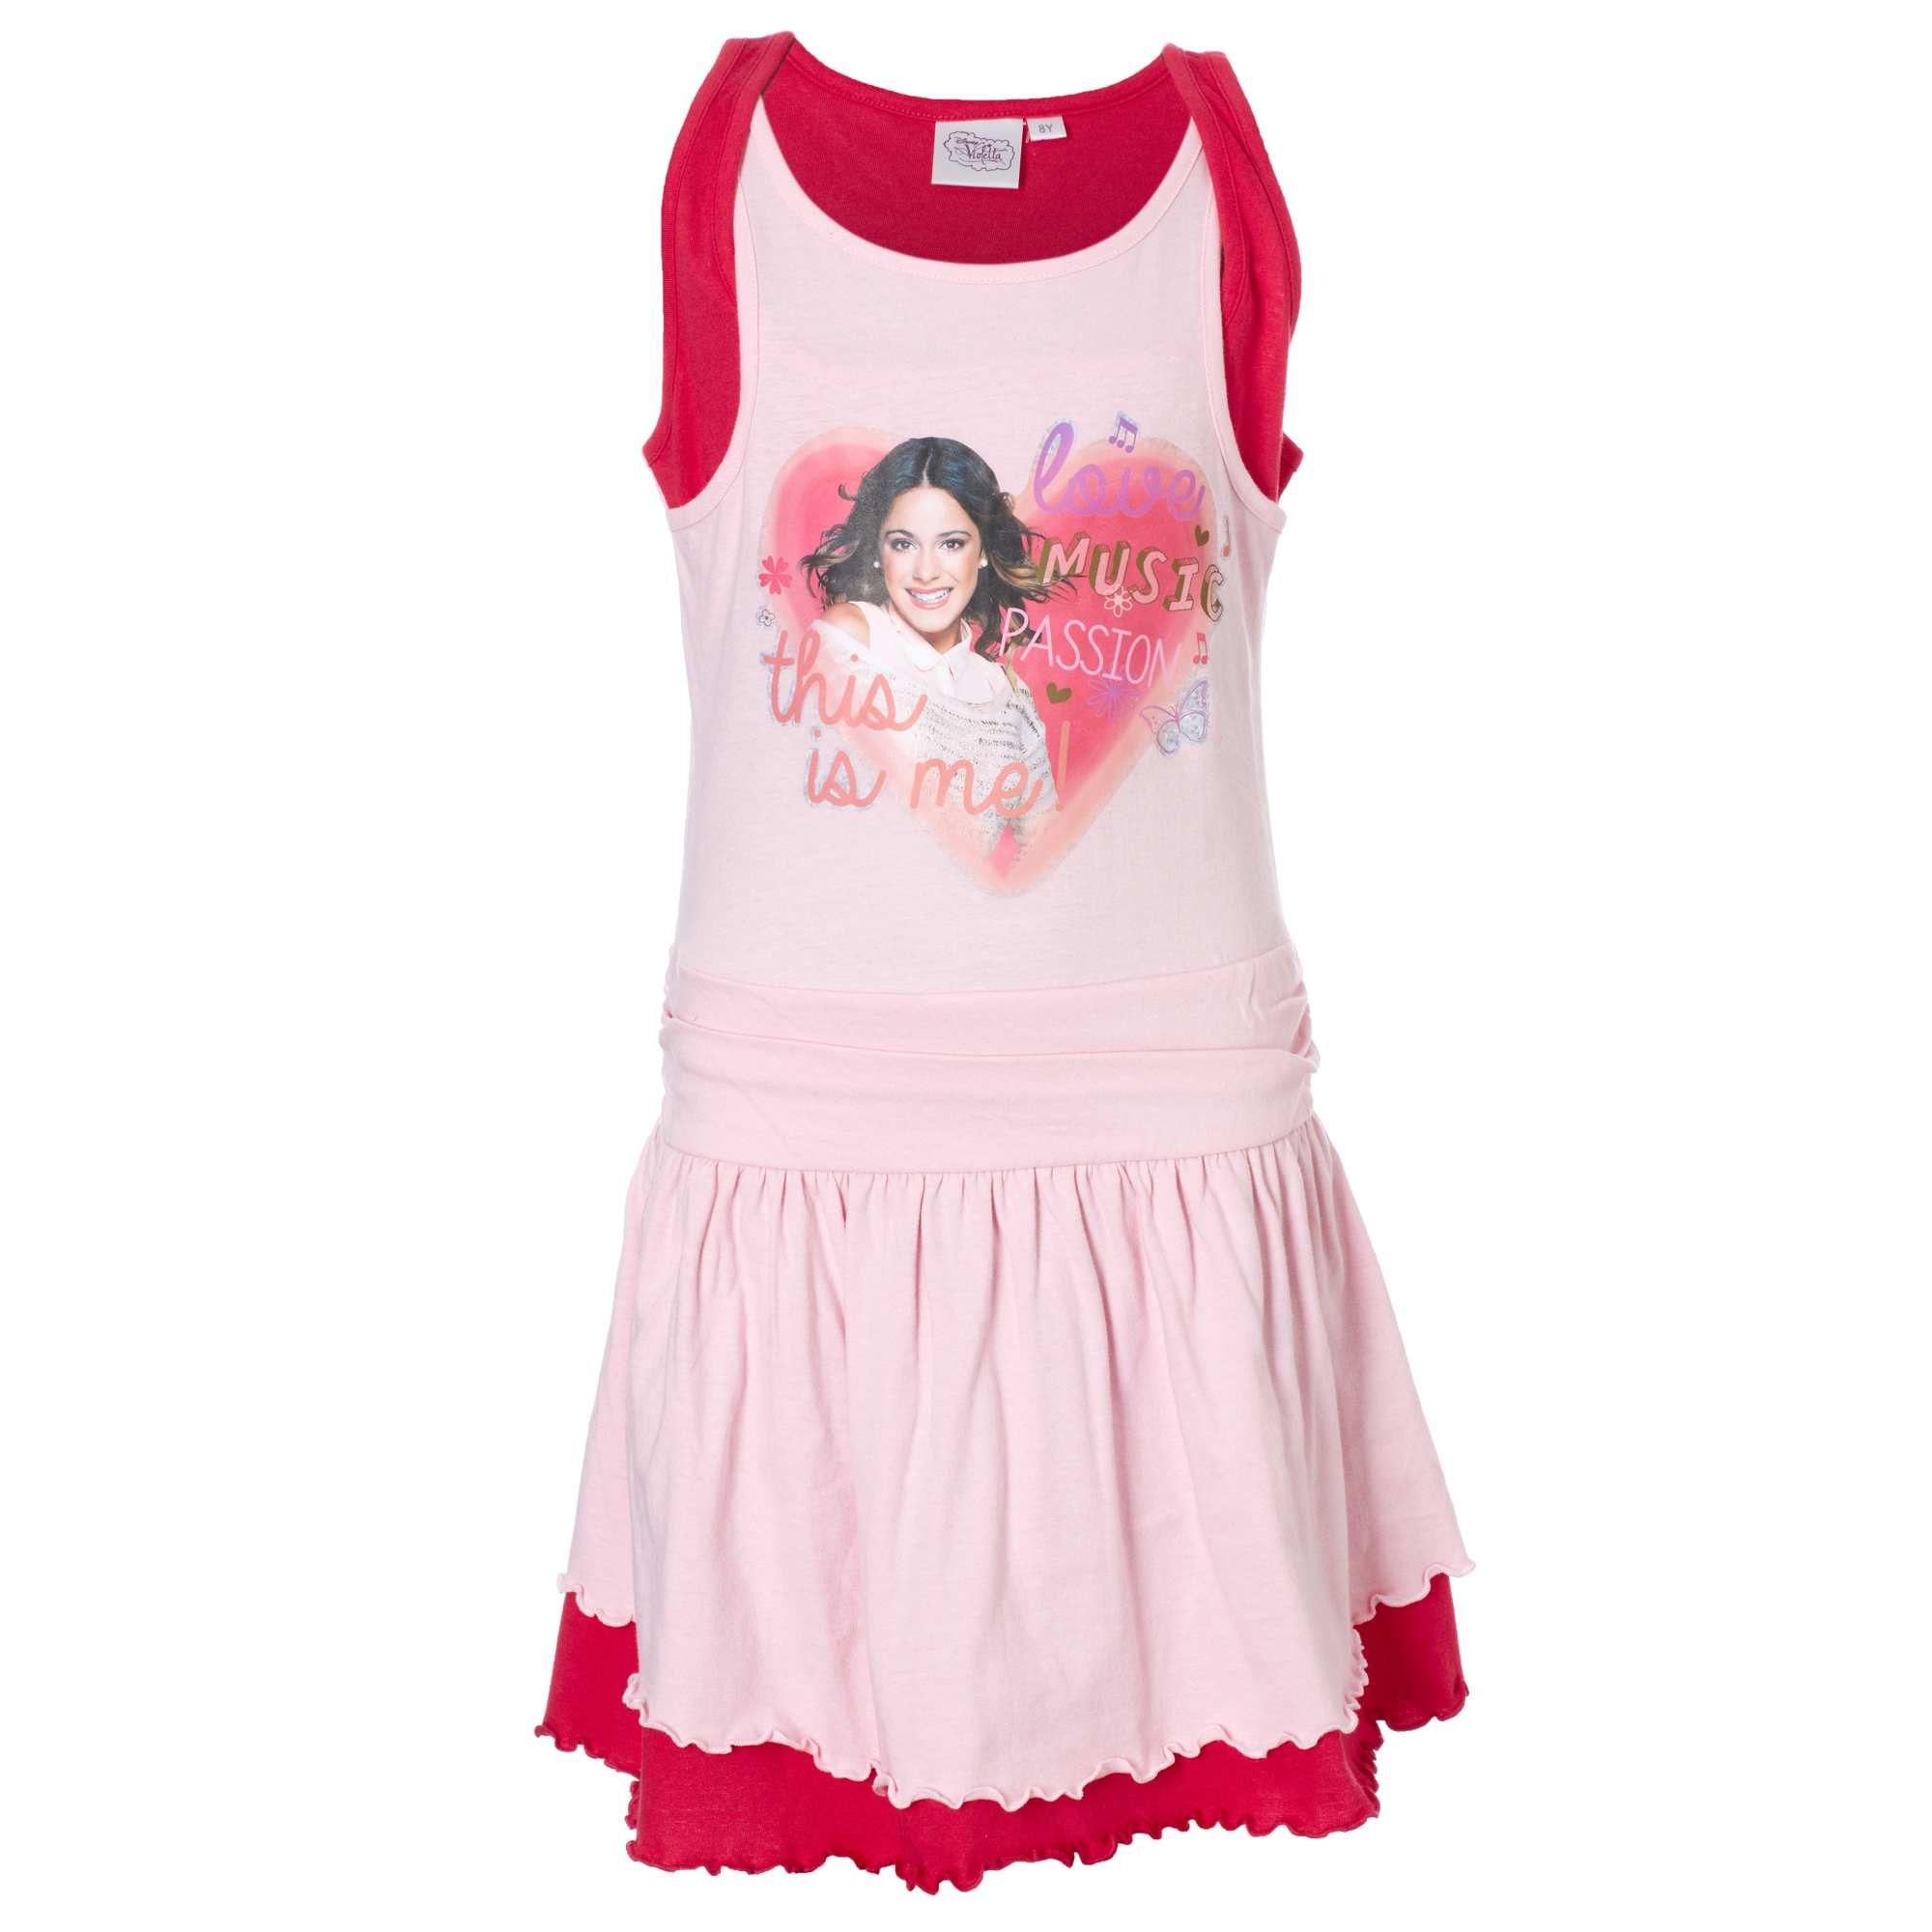 Kiabi robe rouge fille